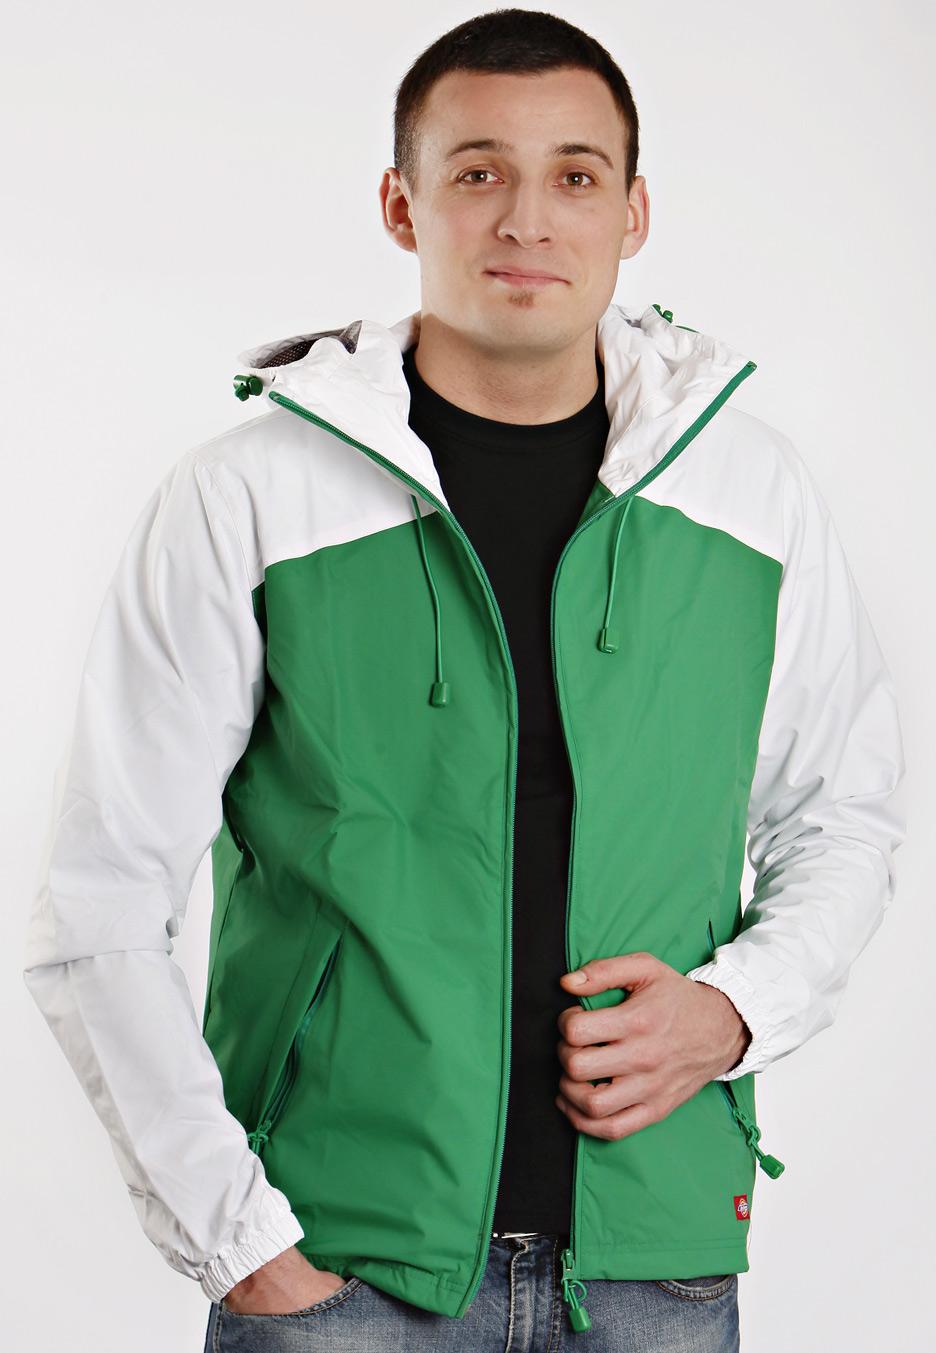 Dickies - Mclane Emerald Green - Takki - Impericon.com FI 1ce191a5f0